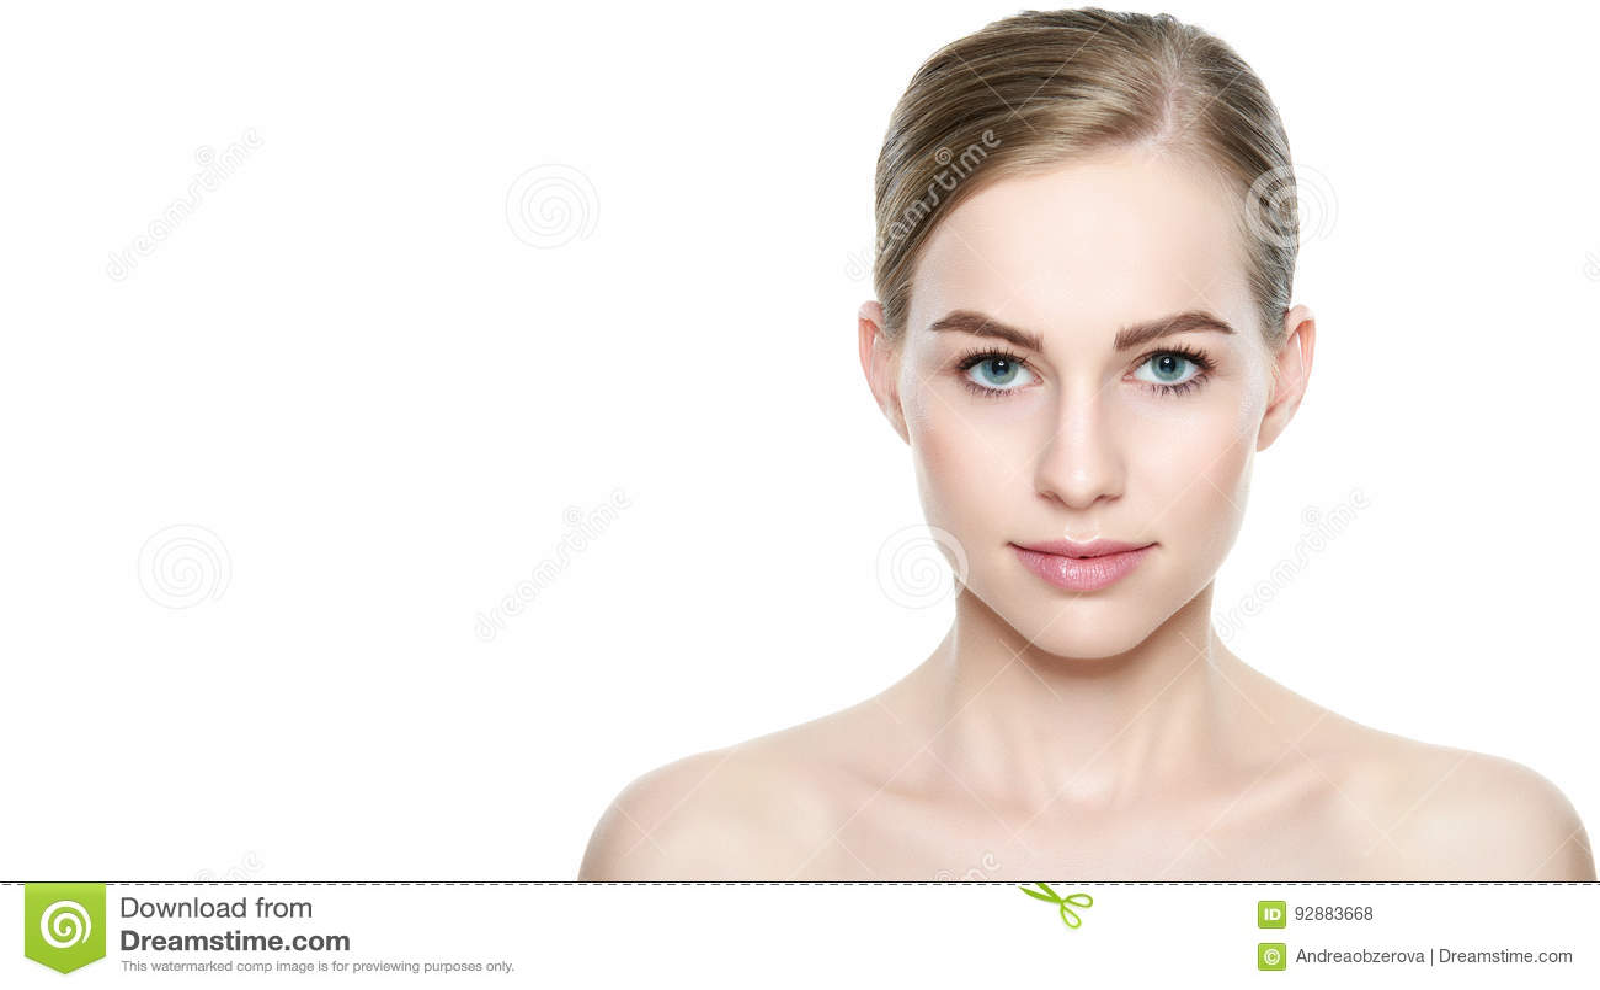 Augen haare welcher lidschatten blaue blonde Lidschatten auftragen: